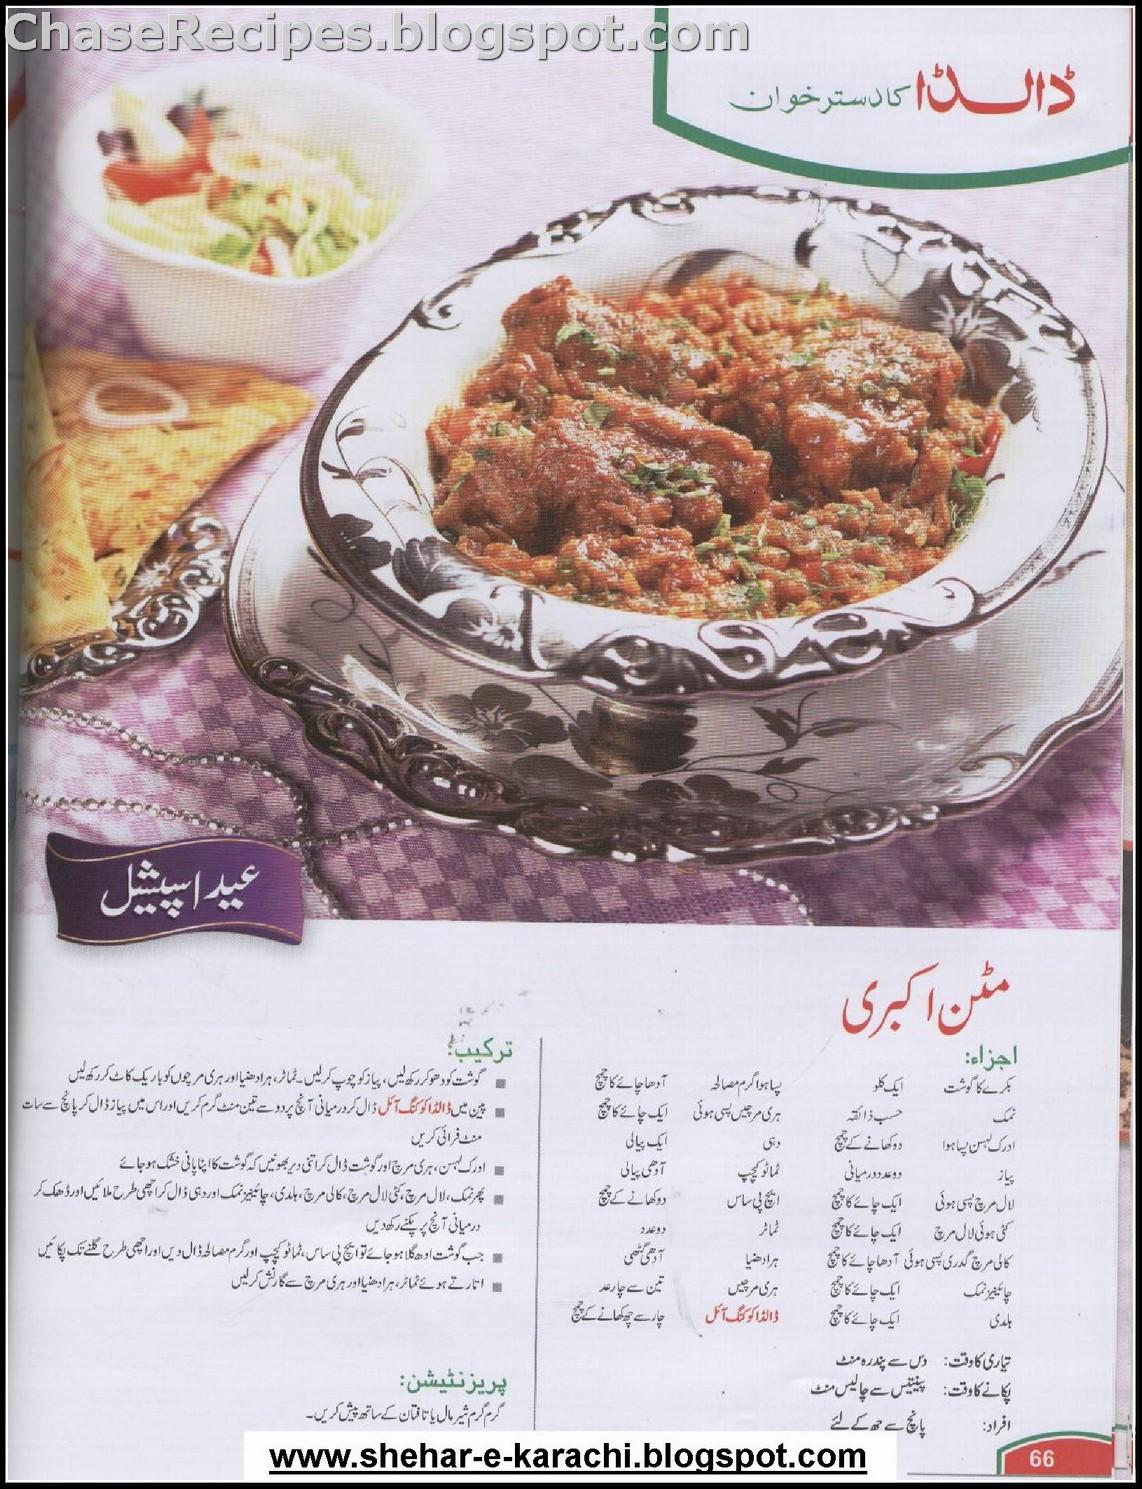 Mutton akbari recipe by dalda in urduhindi chase recipes mutton akbari recipe by dalda in urduhindi forumfinder Gallery